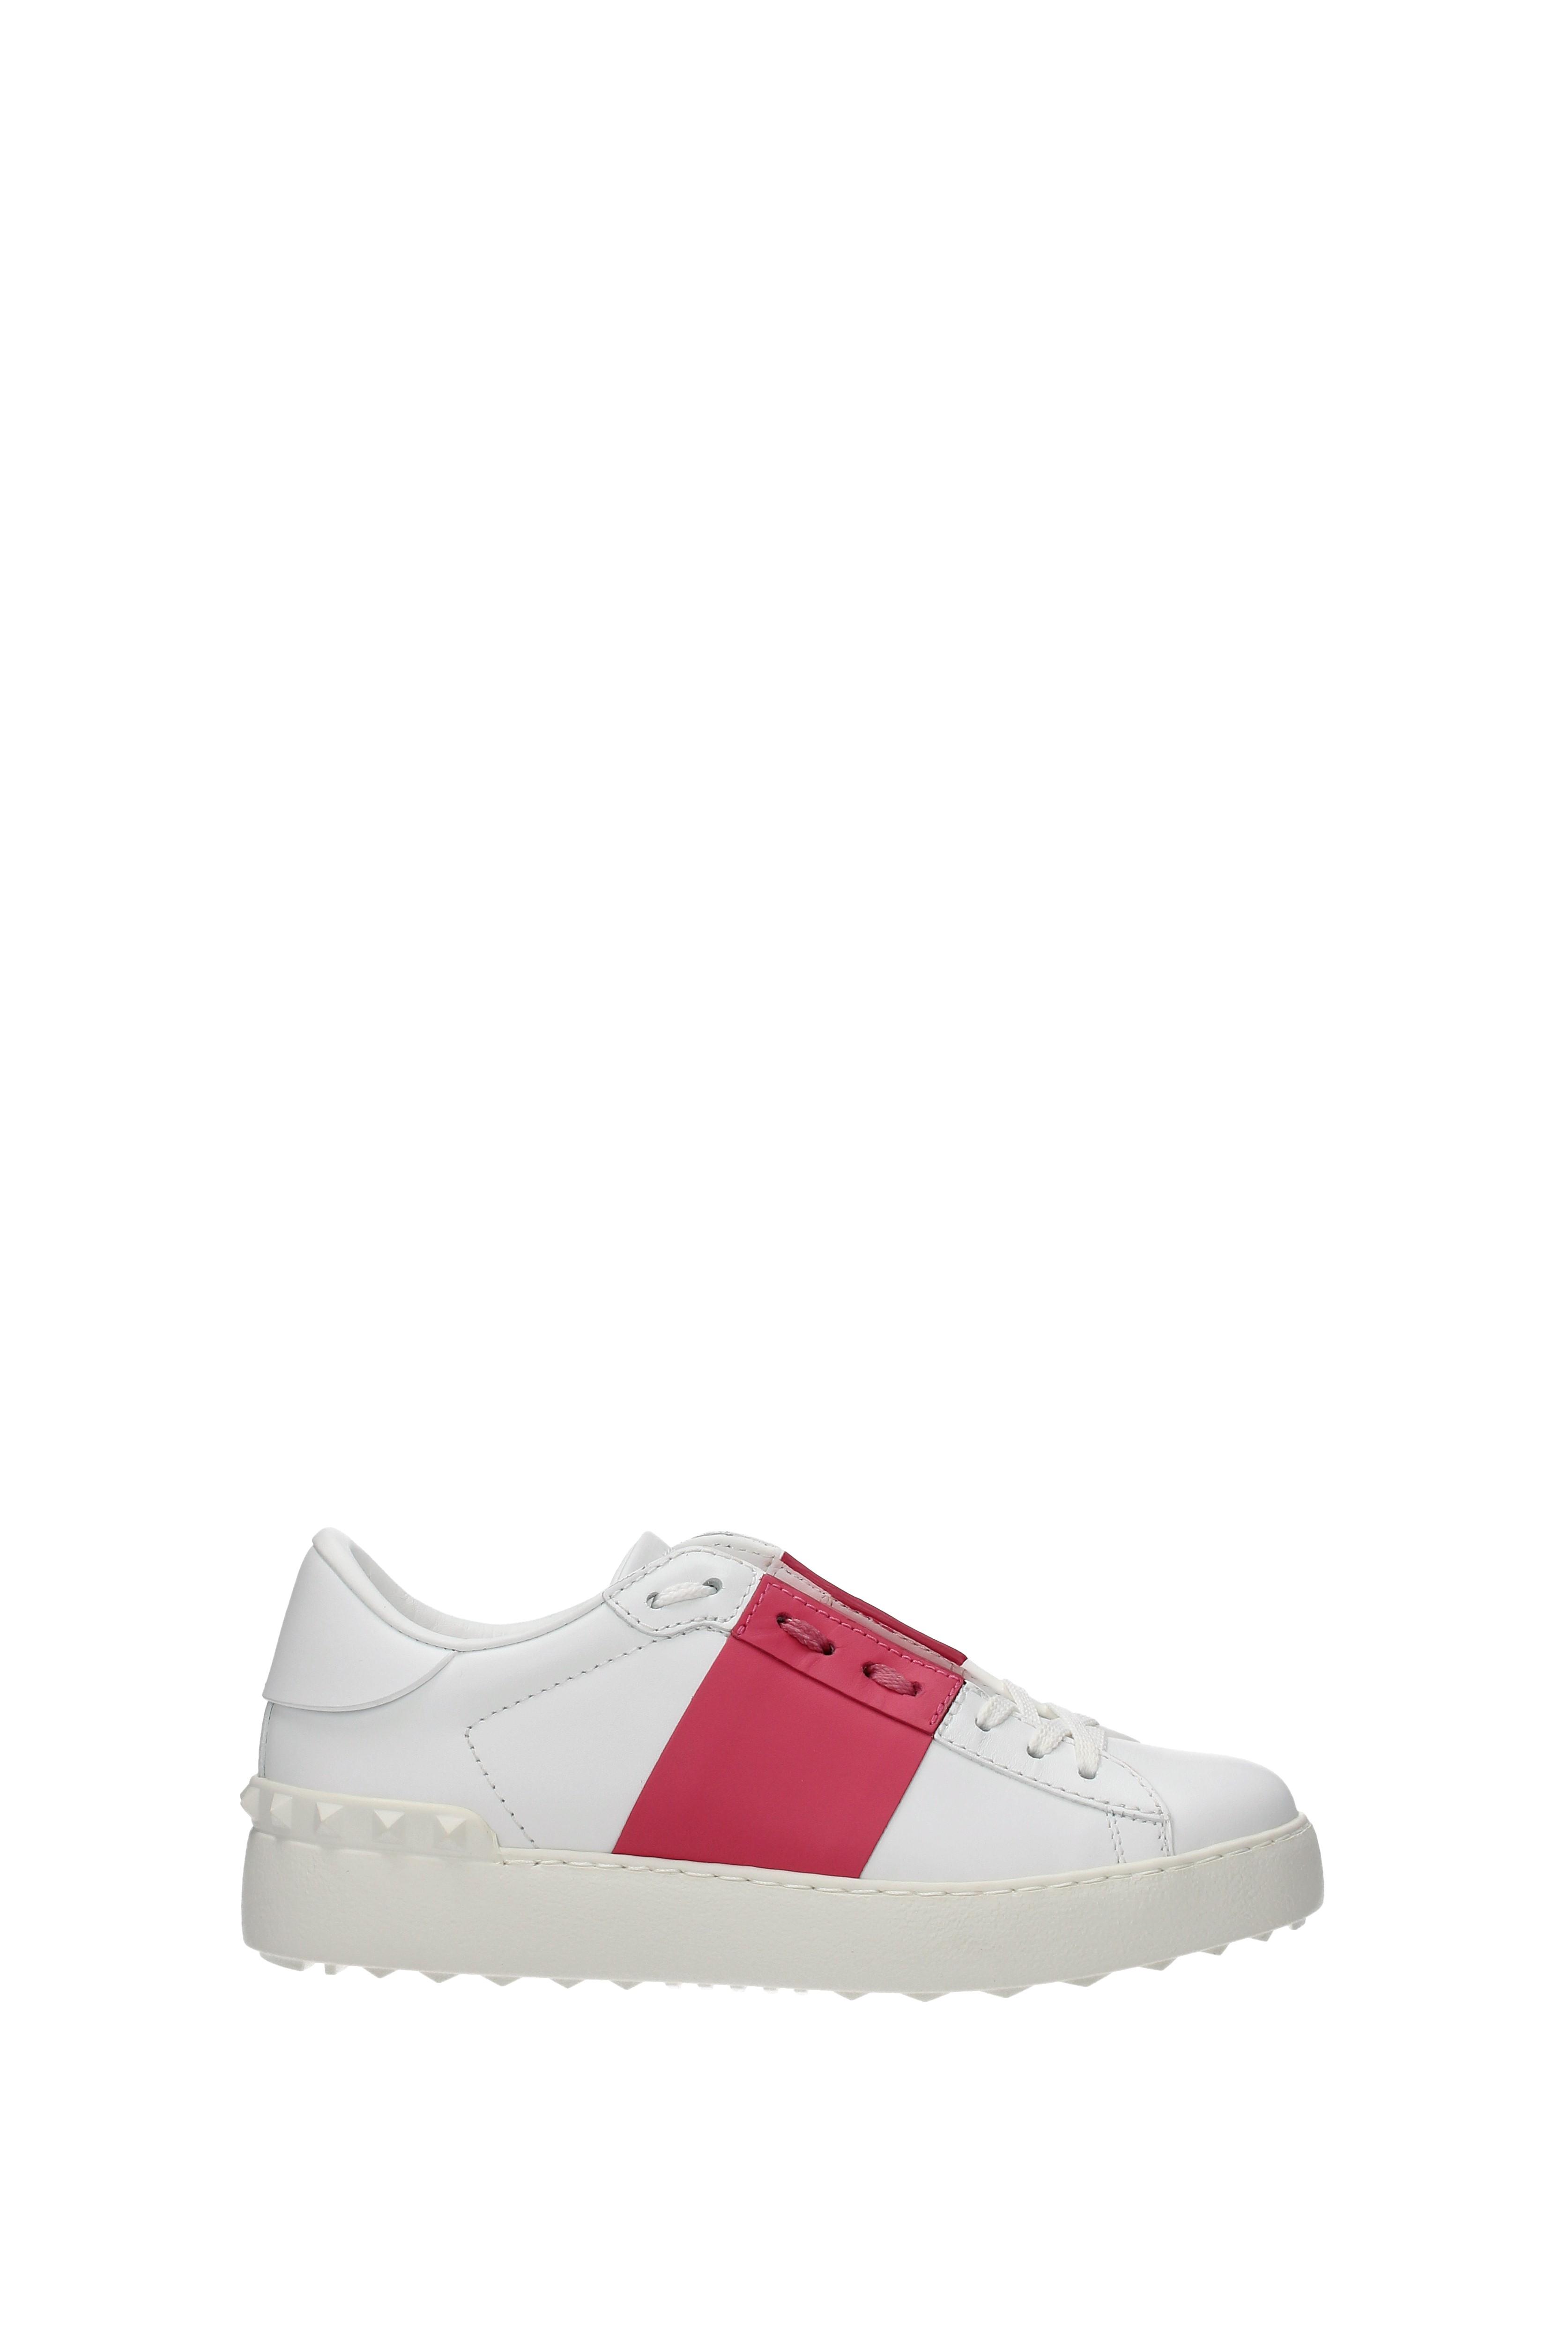 scarpe da ginnastica Valentino Garavani Donna Pelle Pelle Pelle - (1S0781BLU) f9a6ee